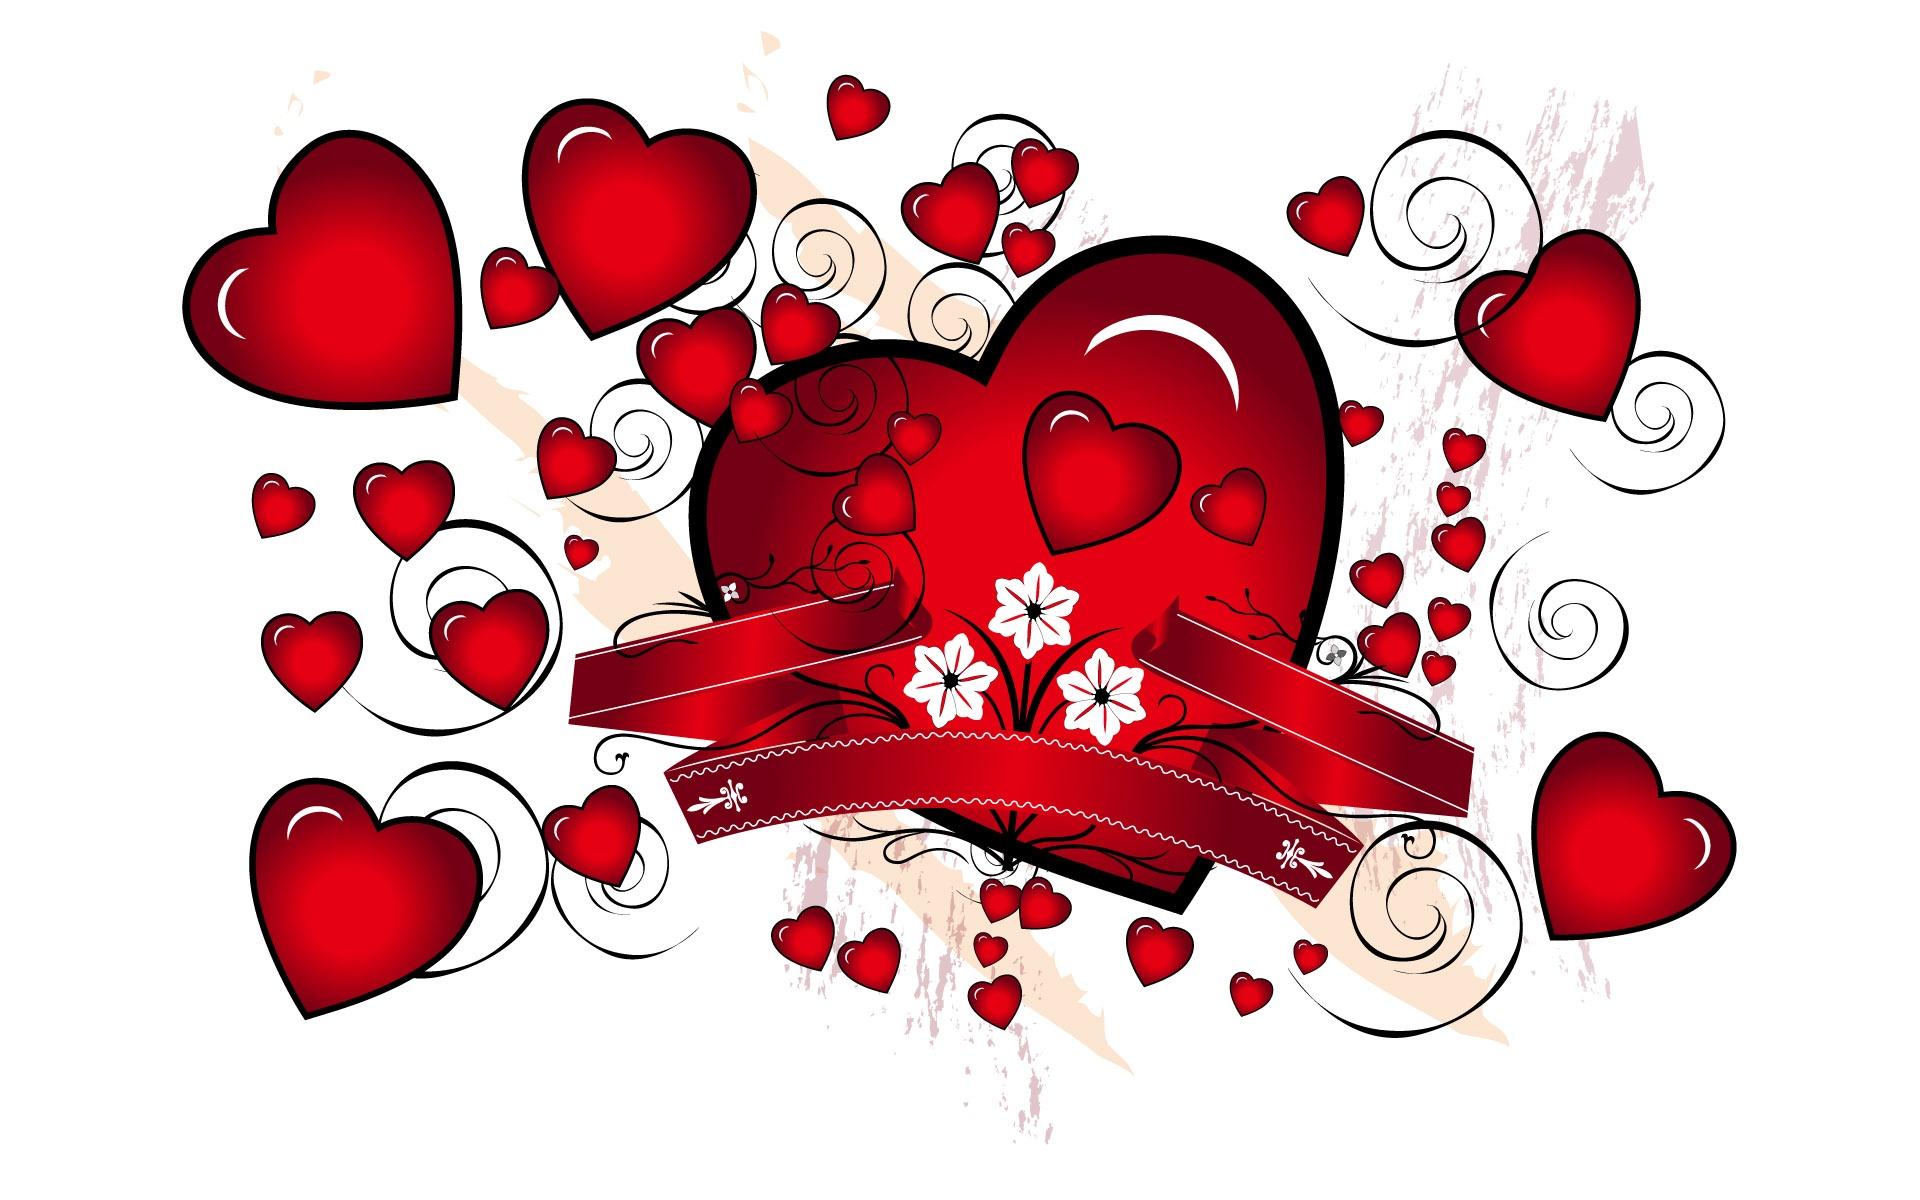 Romantic-red-heart_1920x1200